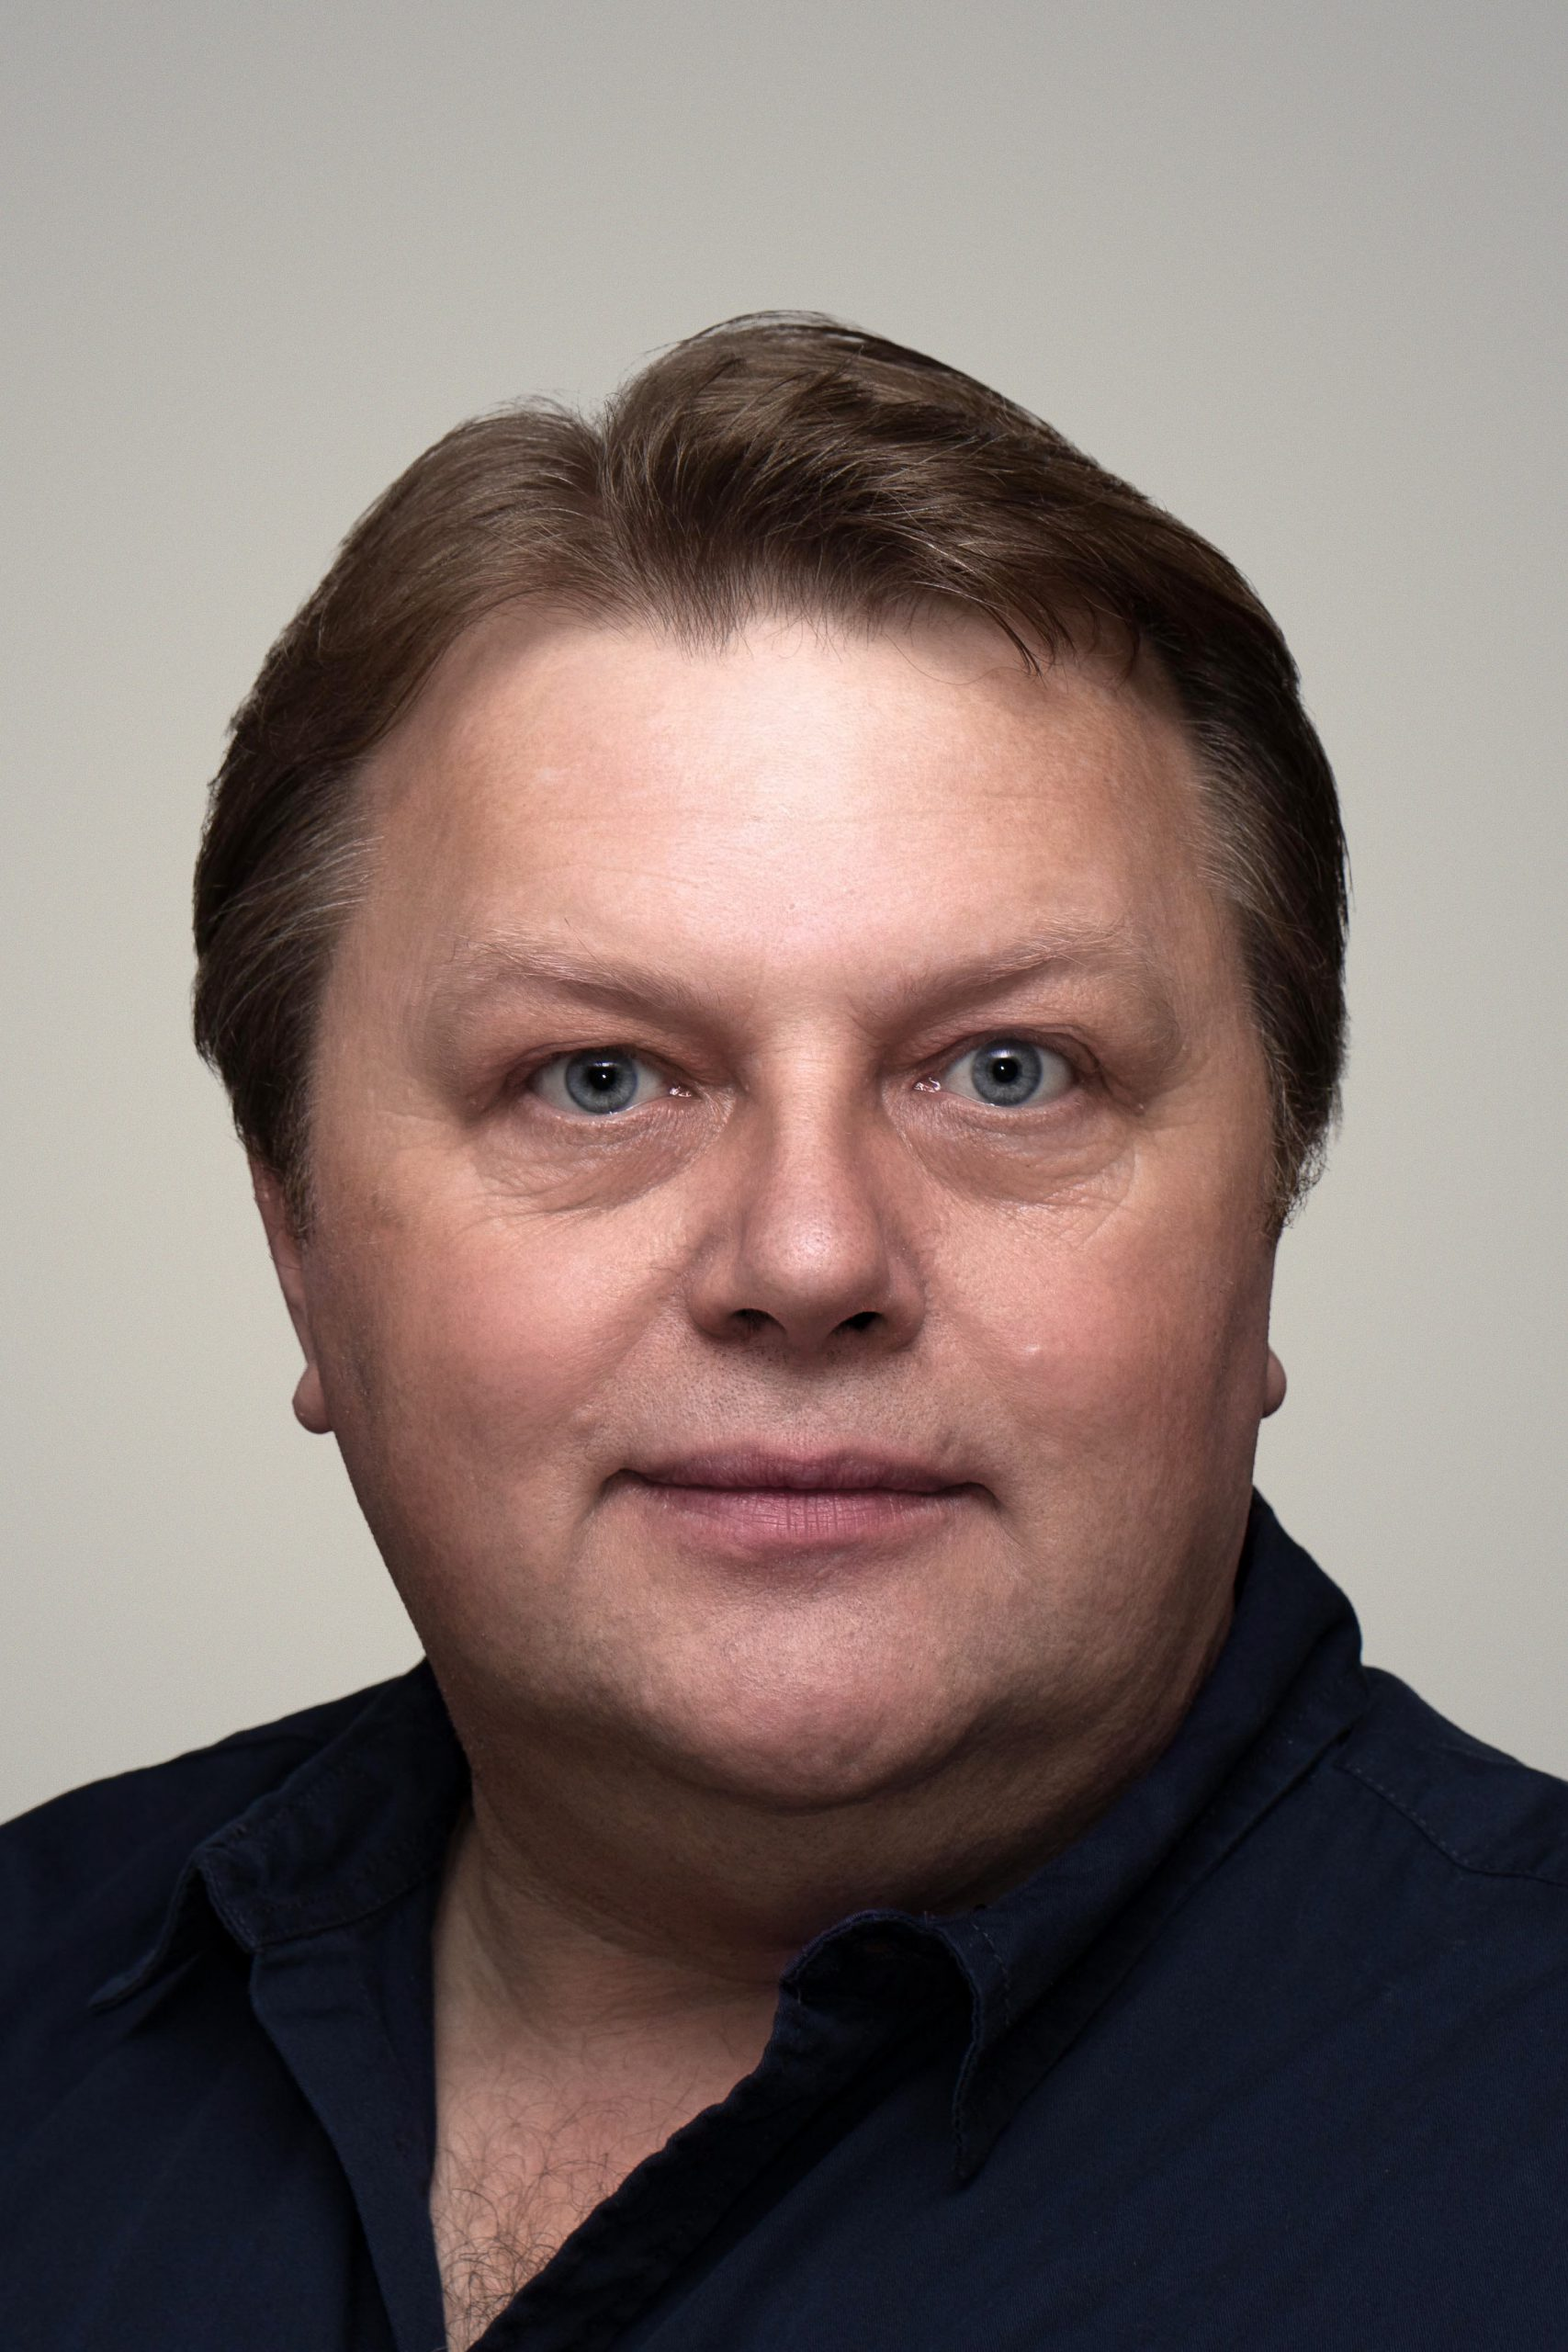 Alwin Wagner (55)